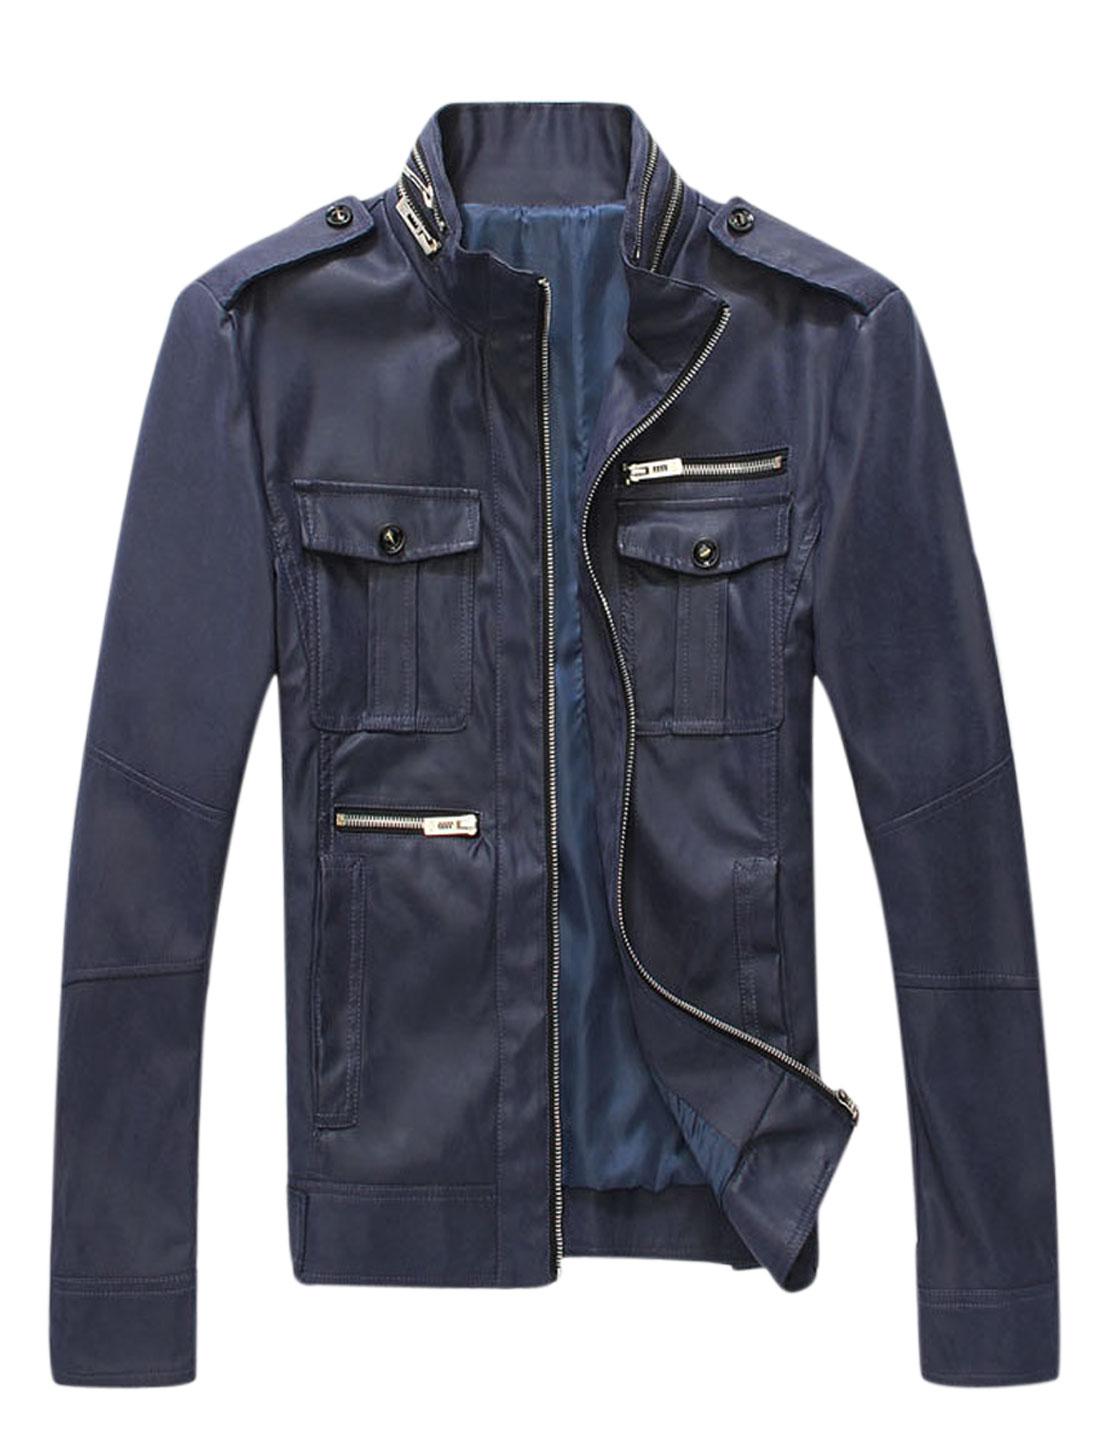 Men Two Flap Chest Pockets Zipper Decor PU Leather Jacket Dark Blue M